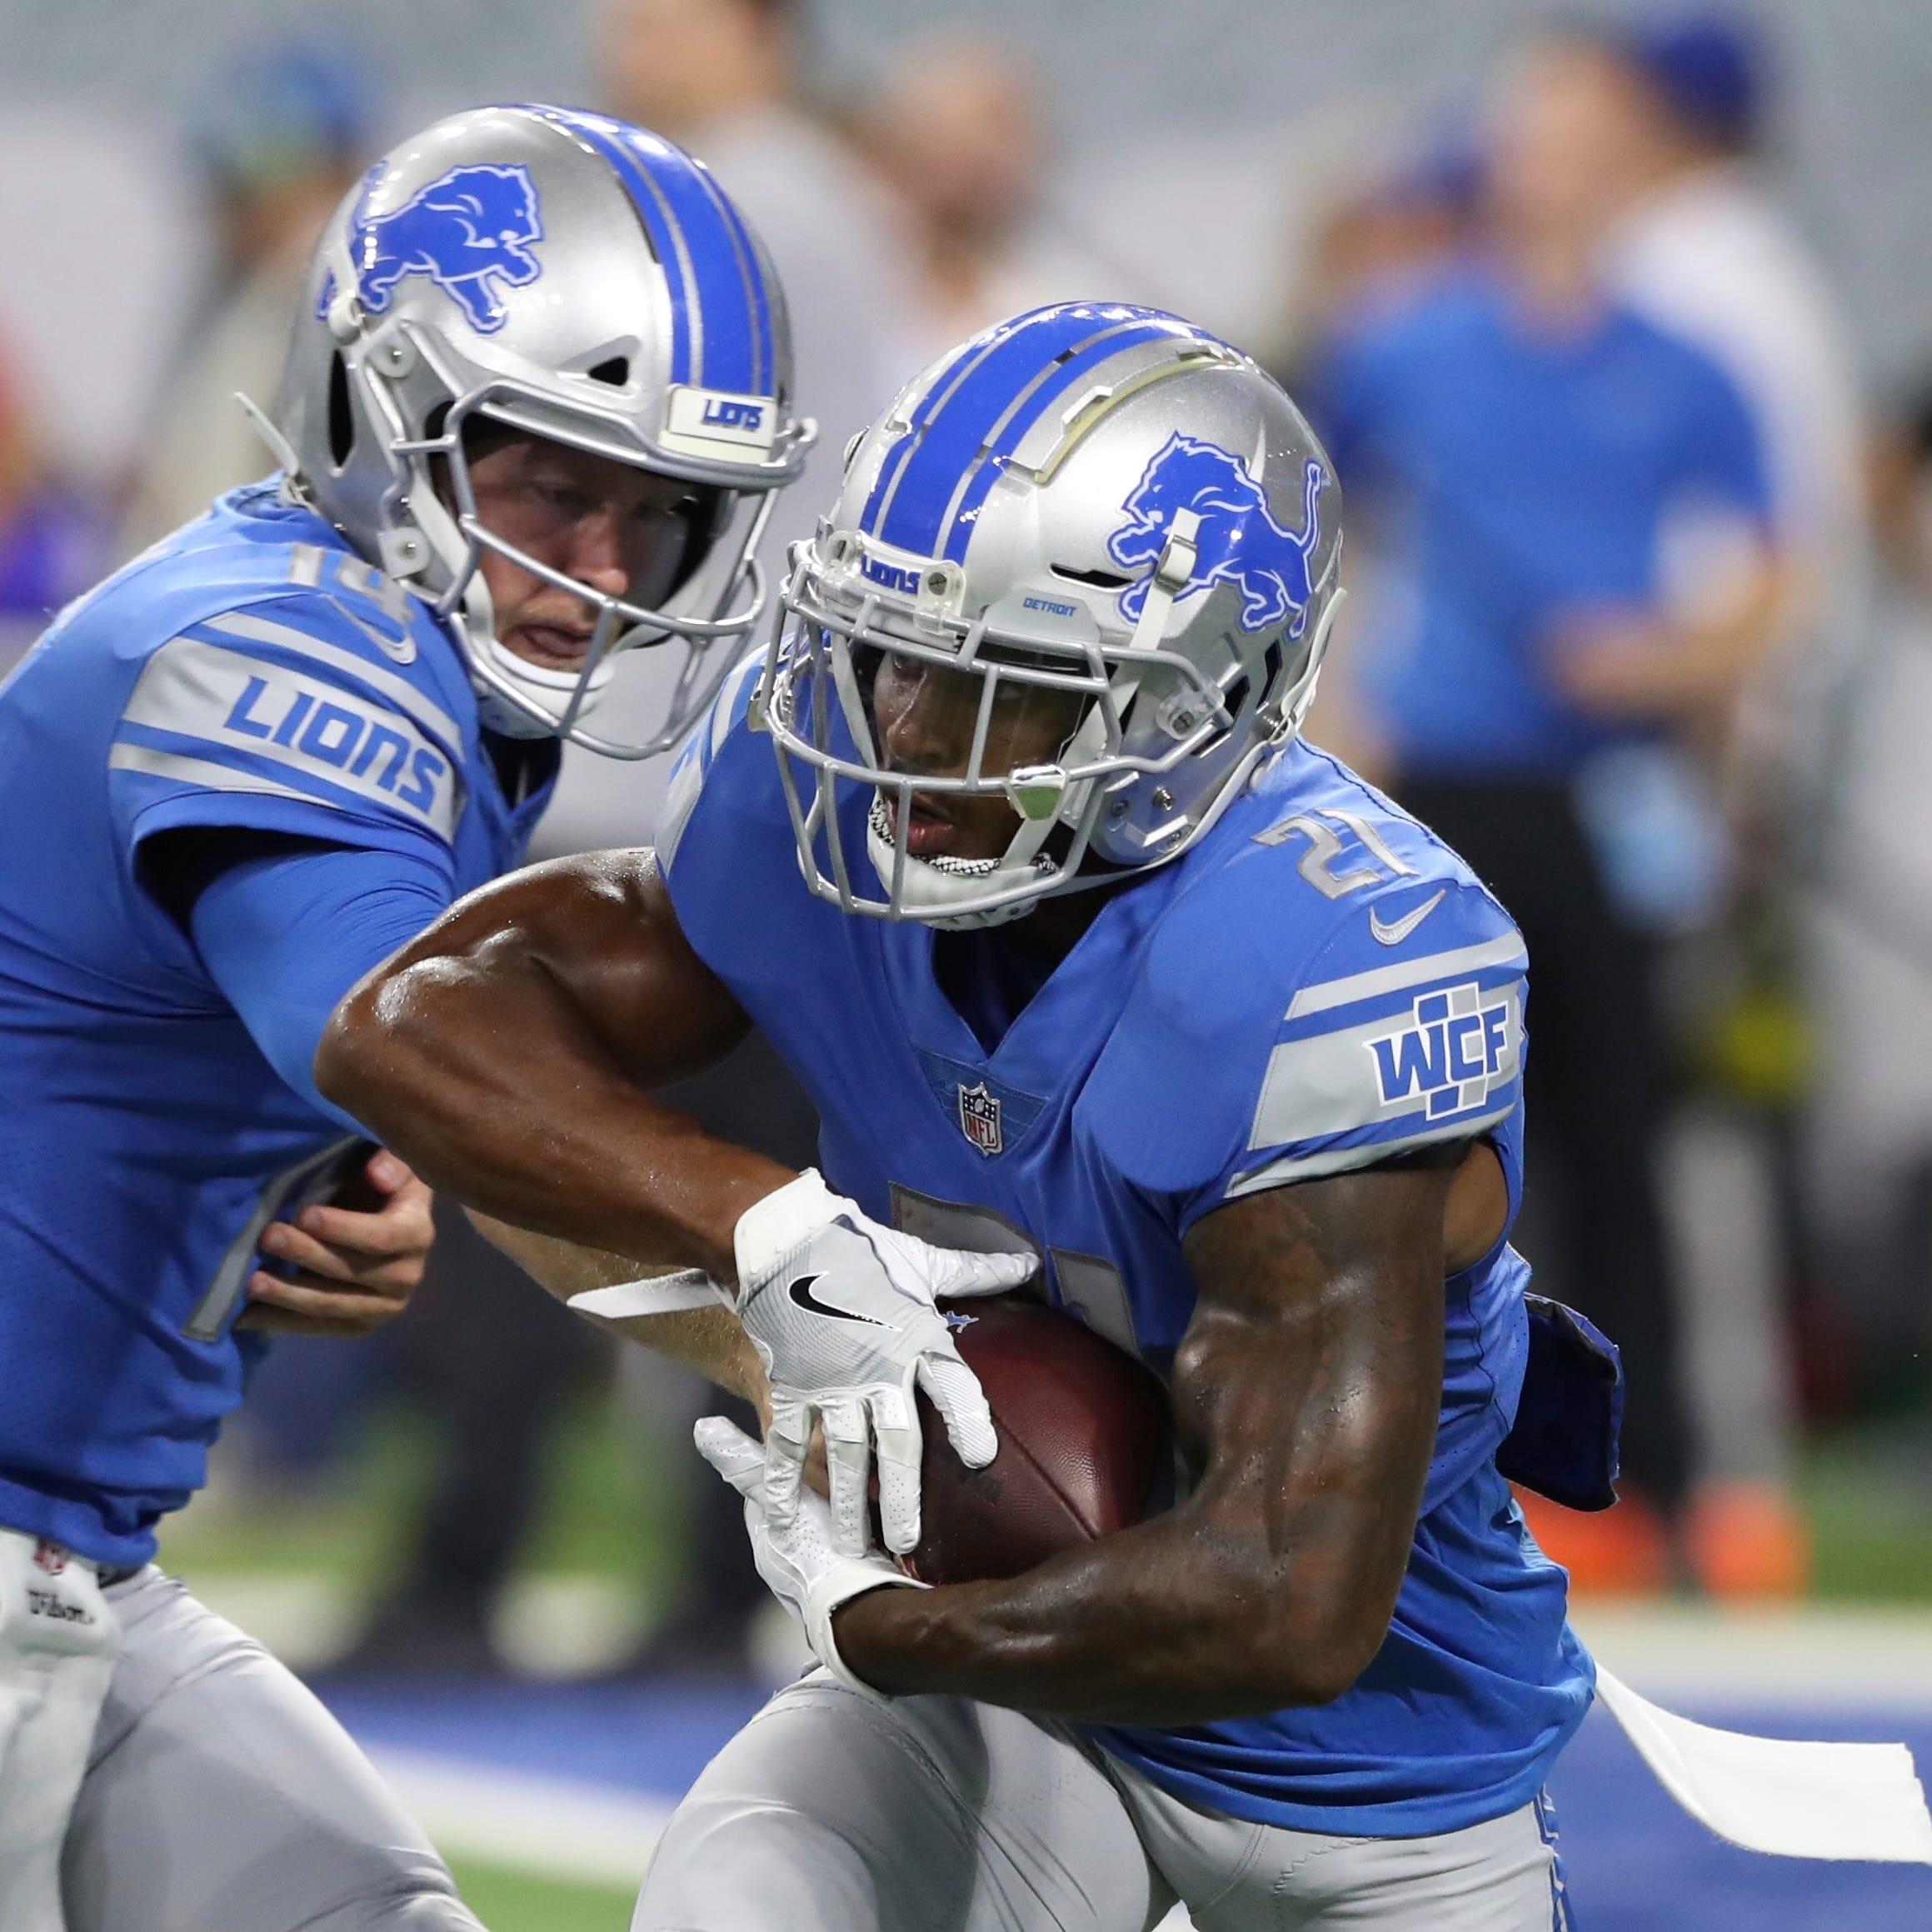 Detroit Lions lose to New York Giants in preseason, 30-17